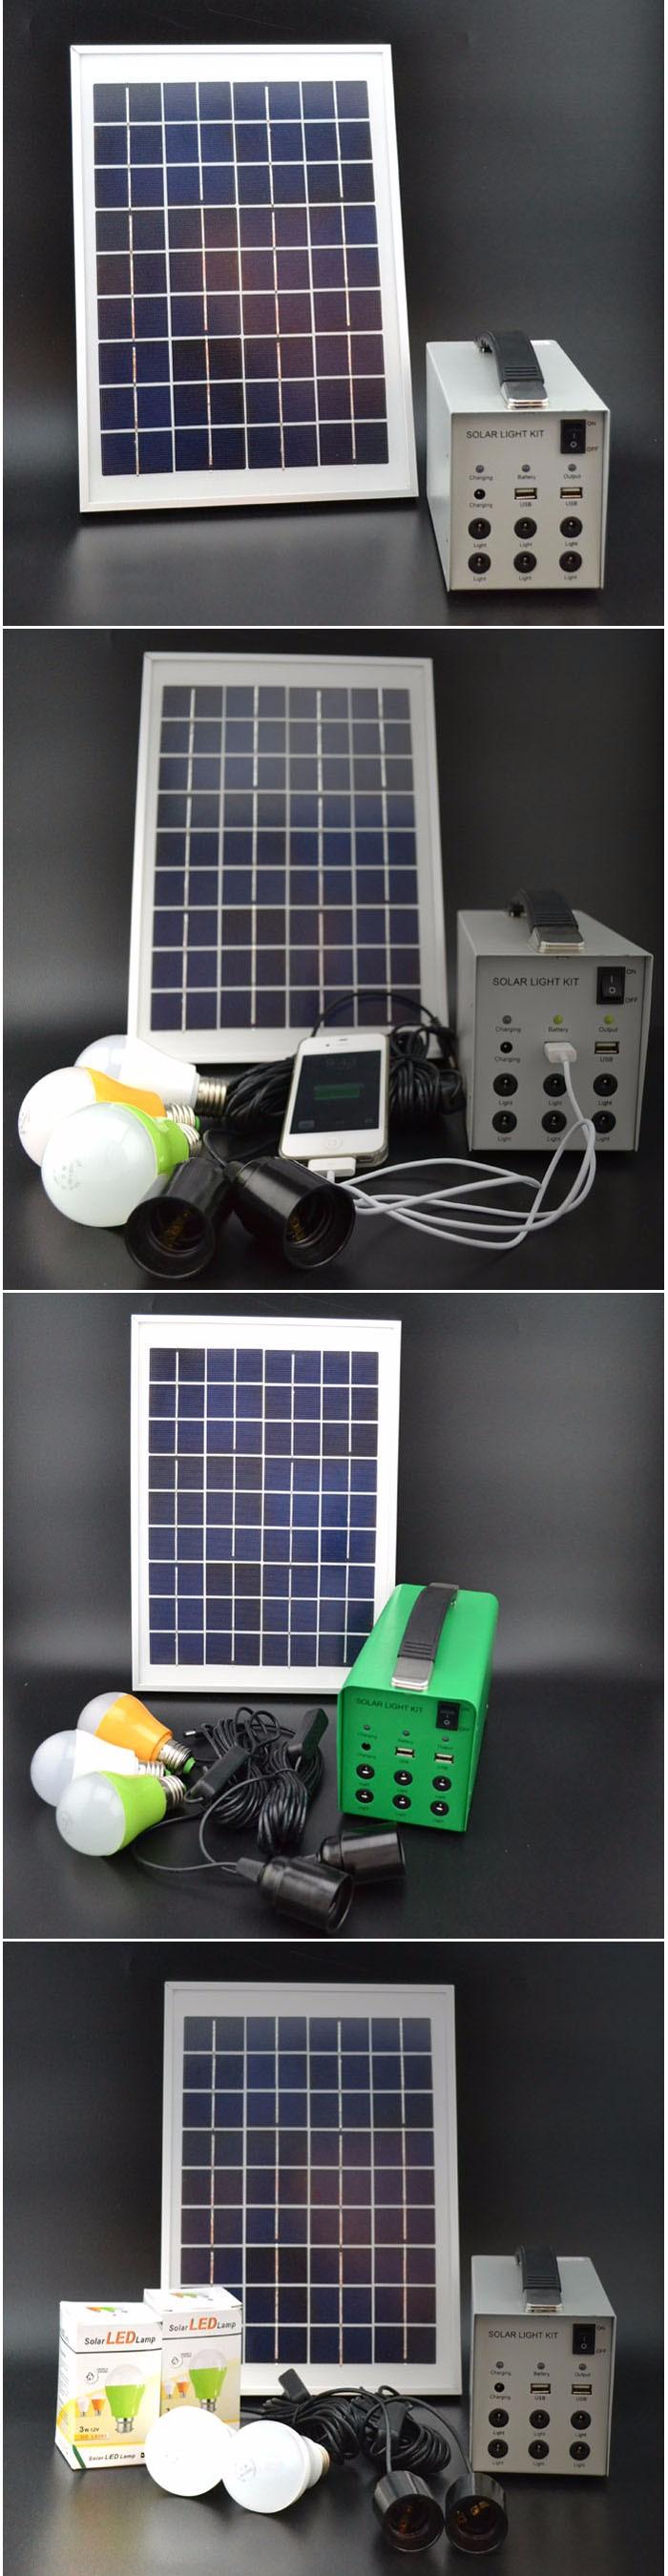 Diy Solar Panel Kits 10w With Led Light,7ah Solar Power Systems Sri Lanka  Price - Buy Solar Panel Kits 10w With Led Light,Led Light,7ah Solar Power